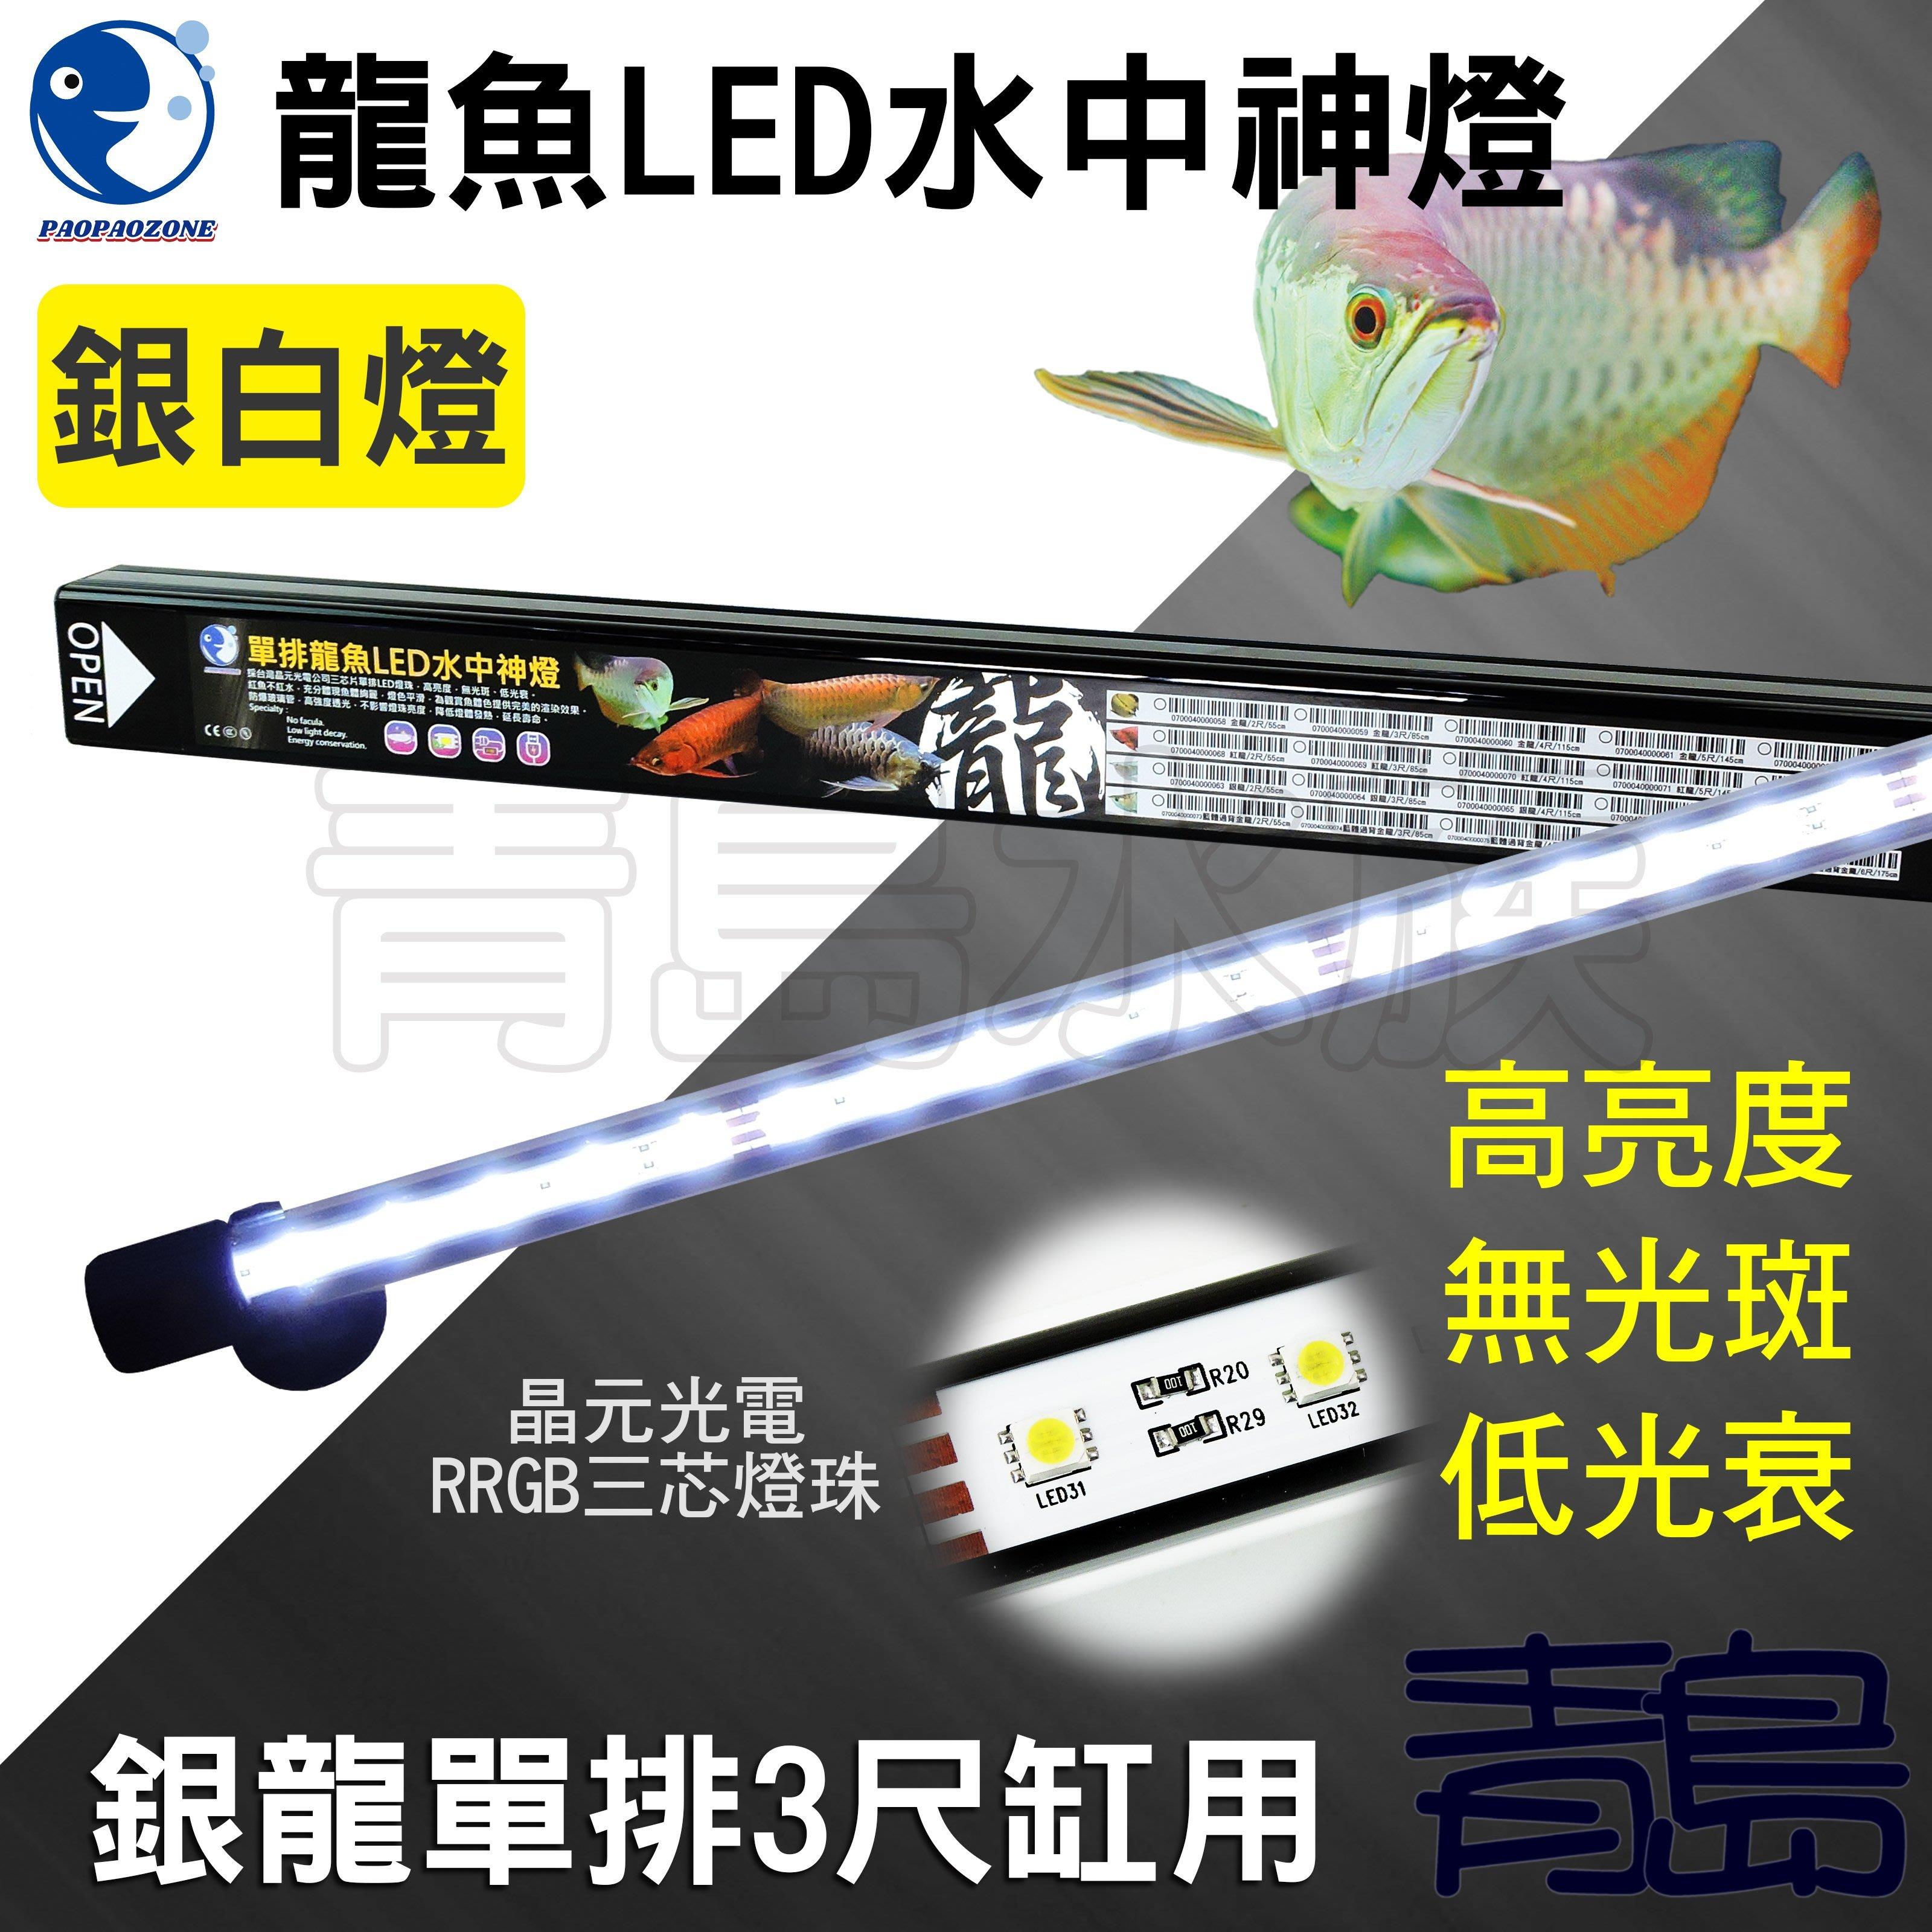 Y。。。青島水族。。。F-340-S85台灣paopaozone泡泡龍-龍魚LED水中燈 亮白 全白燈==單排/銀龍3尺